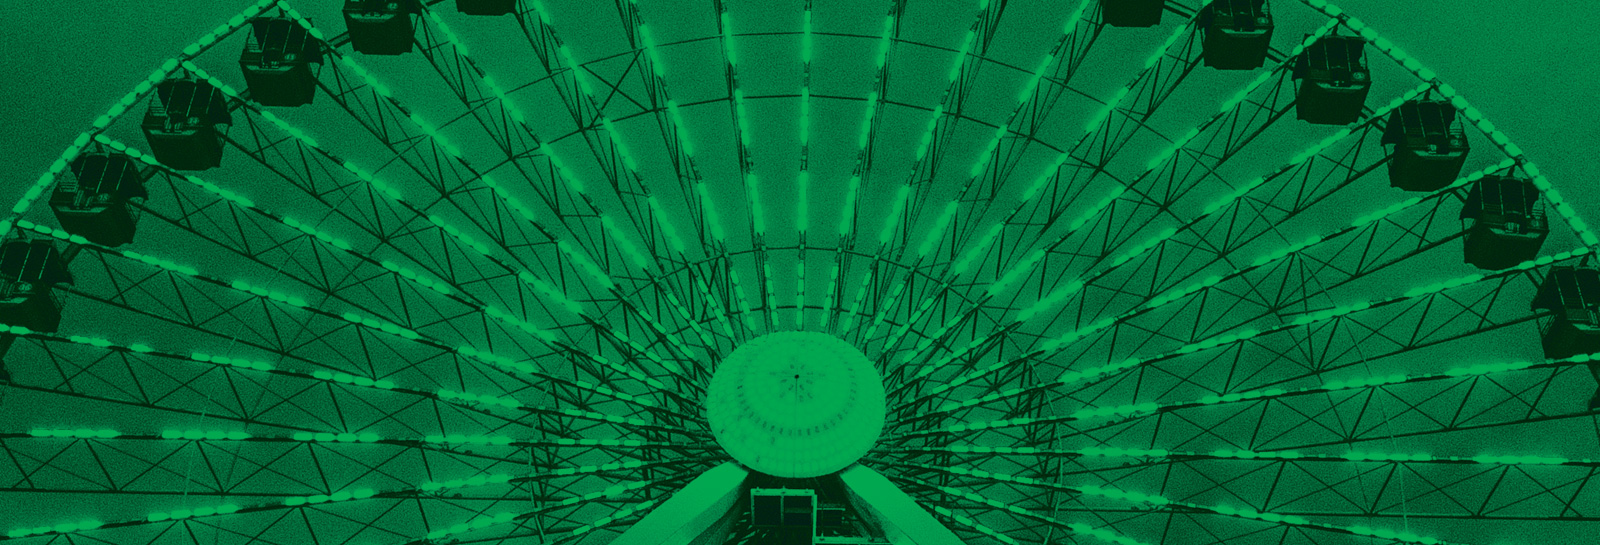 a monocolored green photo of a ferris wheel